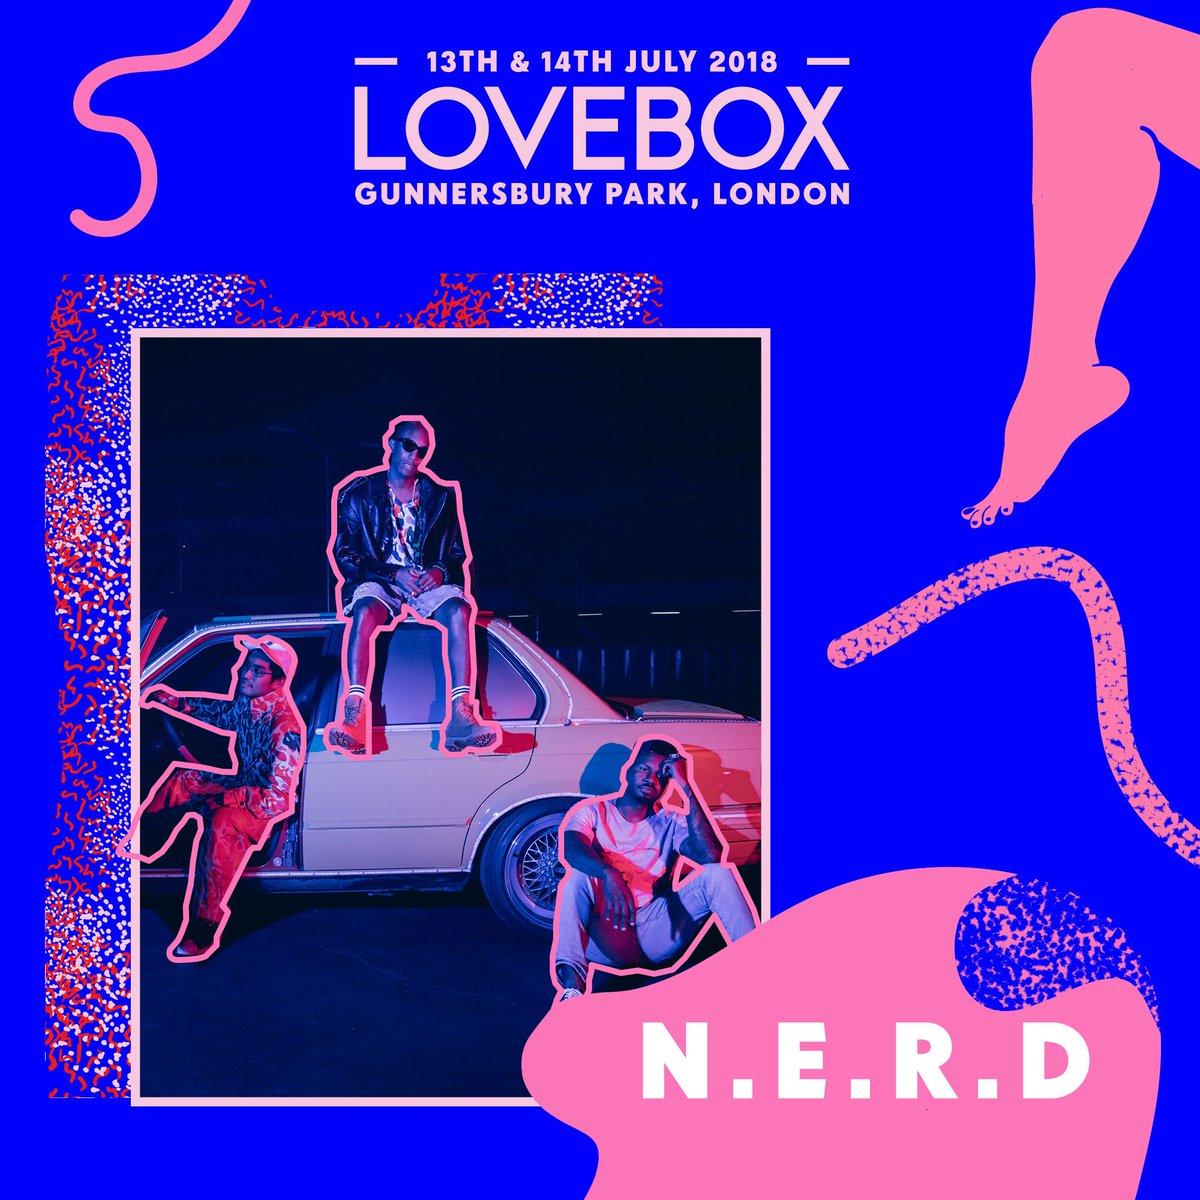 London! I'll see you in July with @NERDarmy @LoveBoxfestival! Tix  at https://t.co/hGIihZ6Ffm #NOONEEVERREALLYDIES ???? https://t.co/6H3IZXejKT